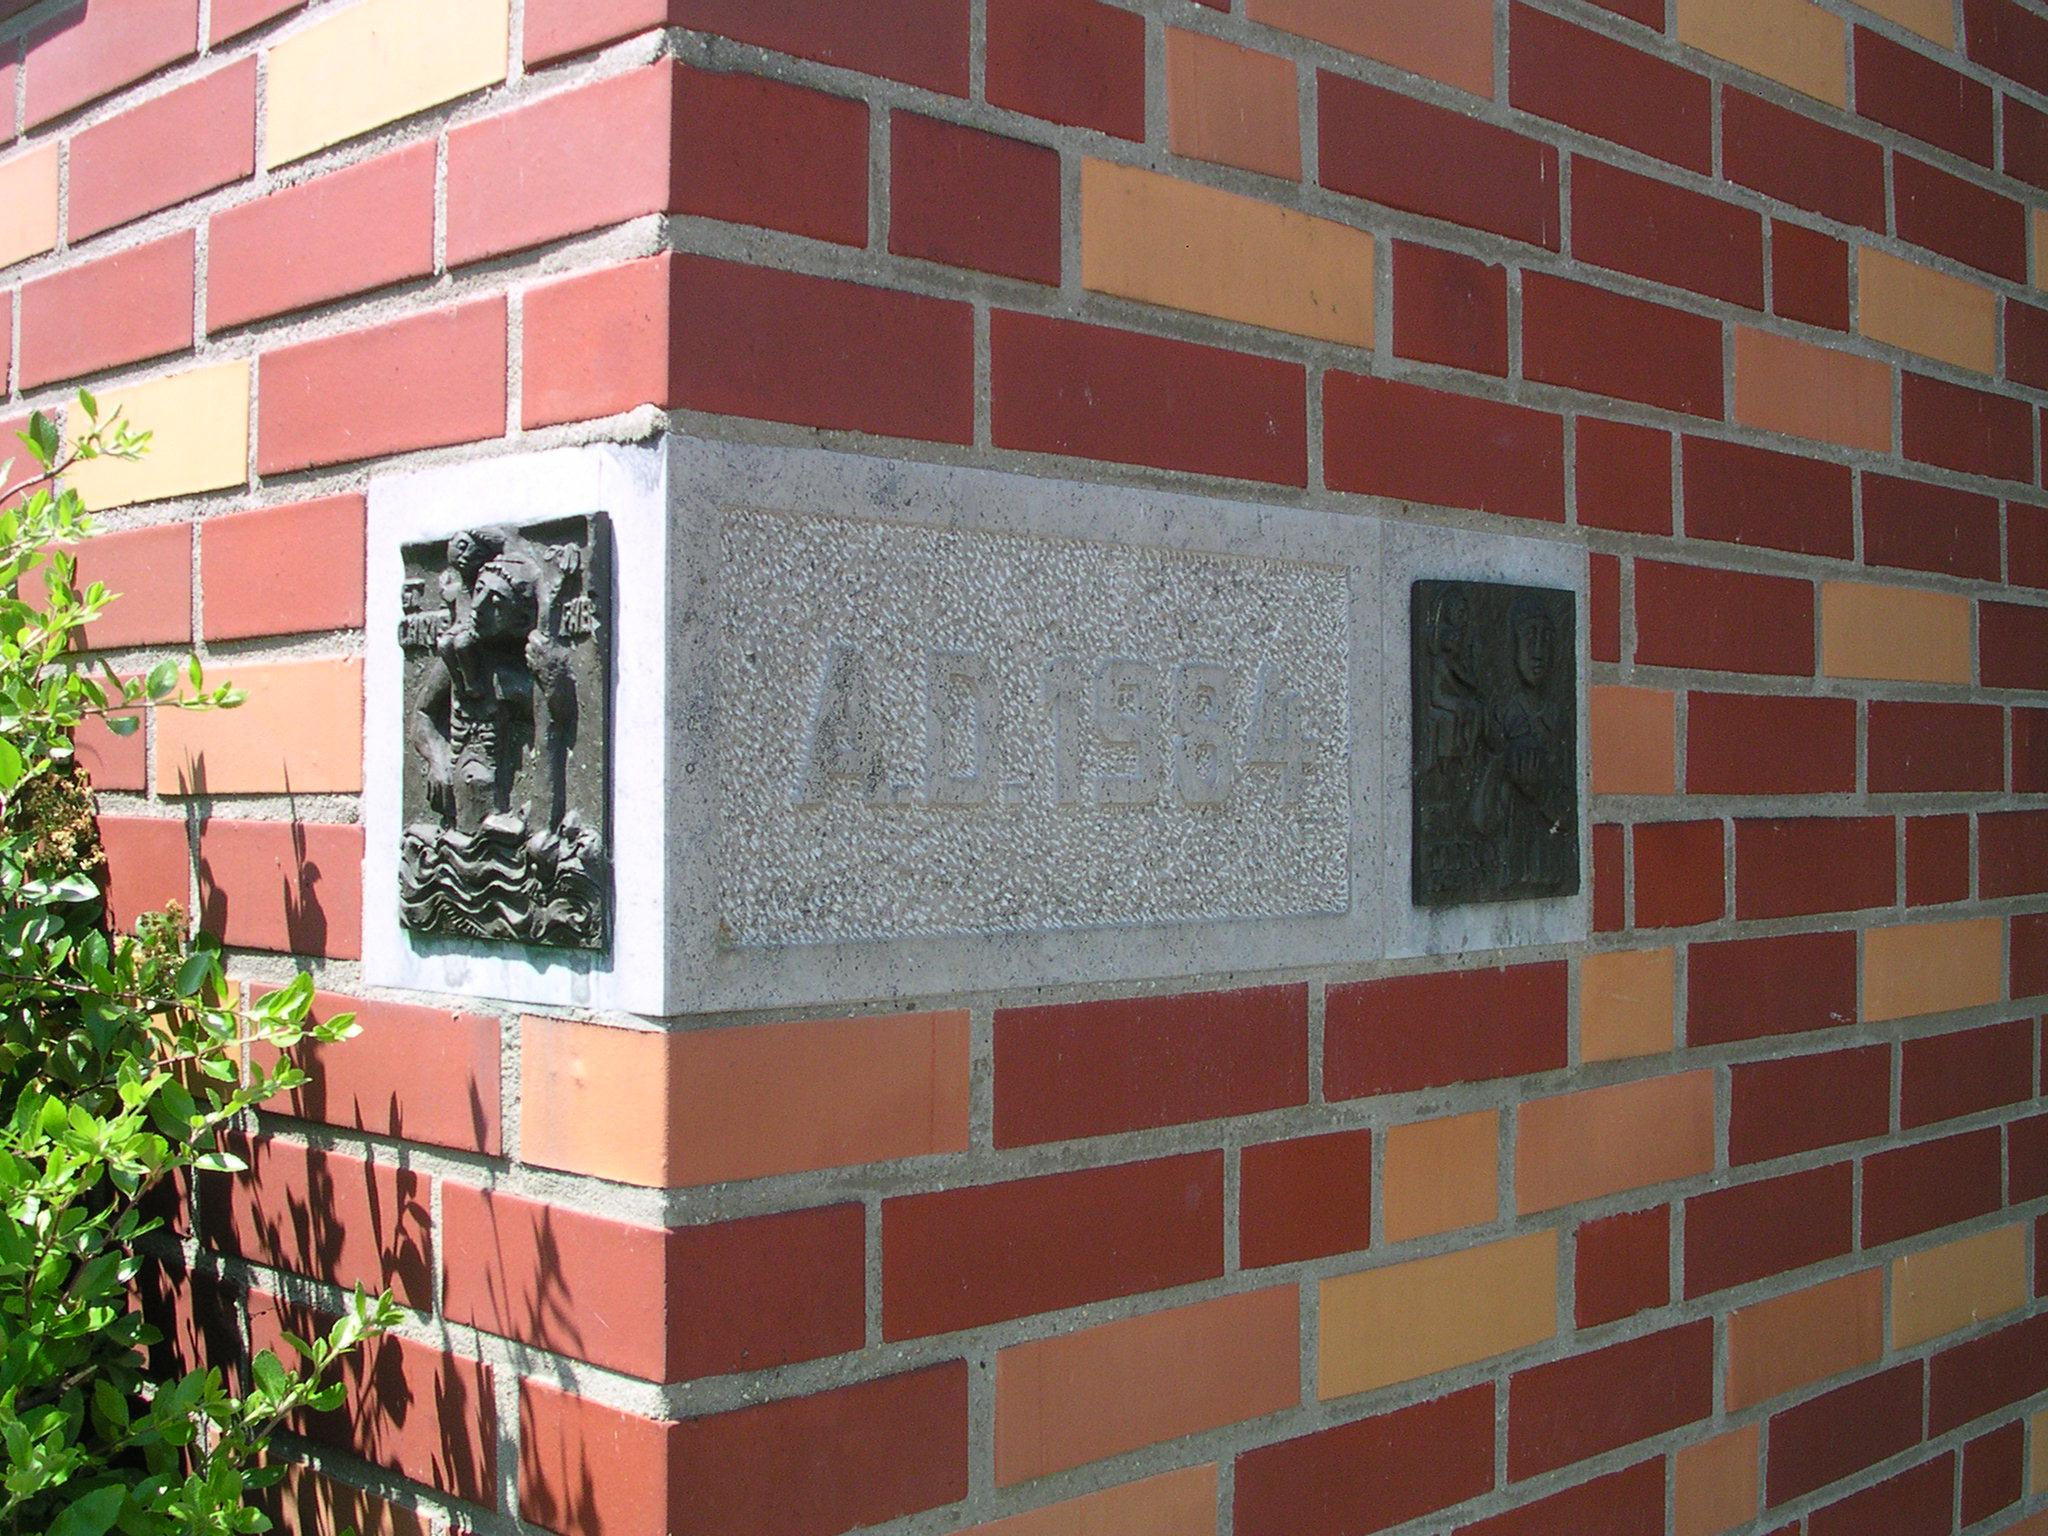 cornerstone-by-Norbert-Schnitzler.f2d7b2899ada4cee9455e9364bdb75f4.jpg